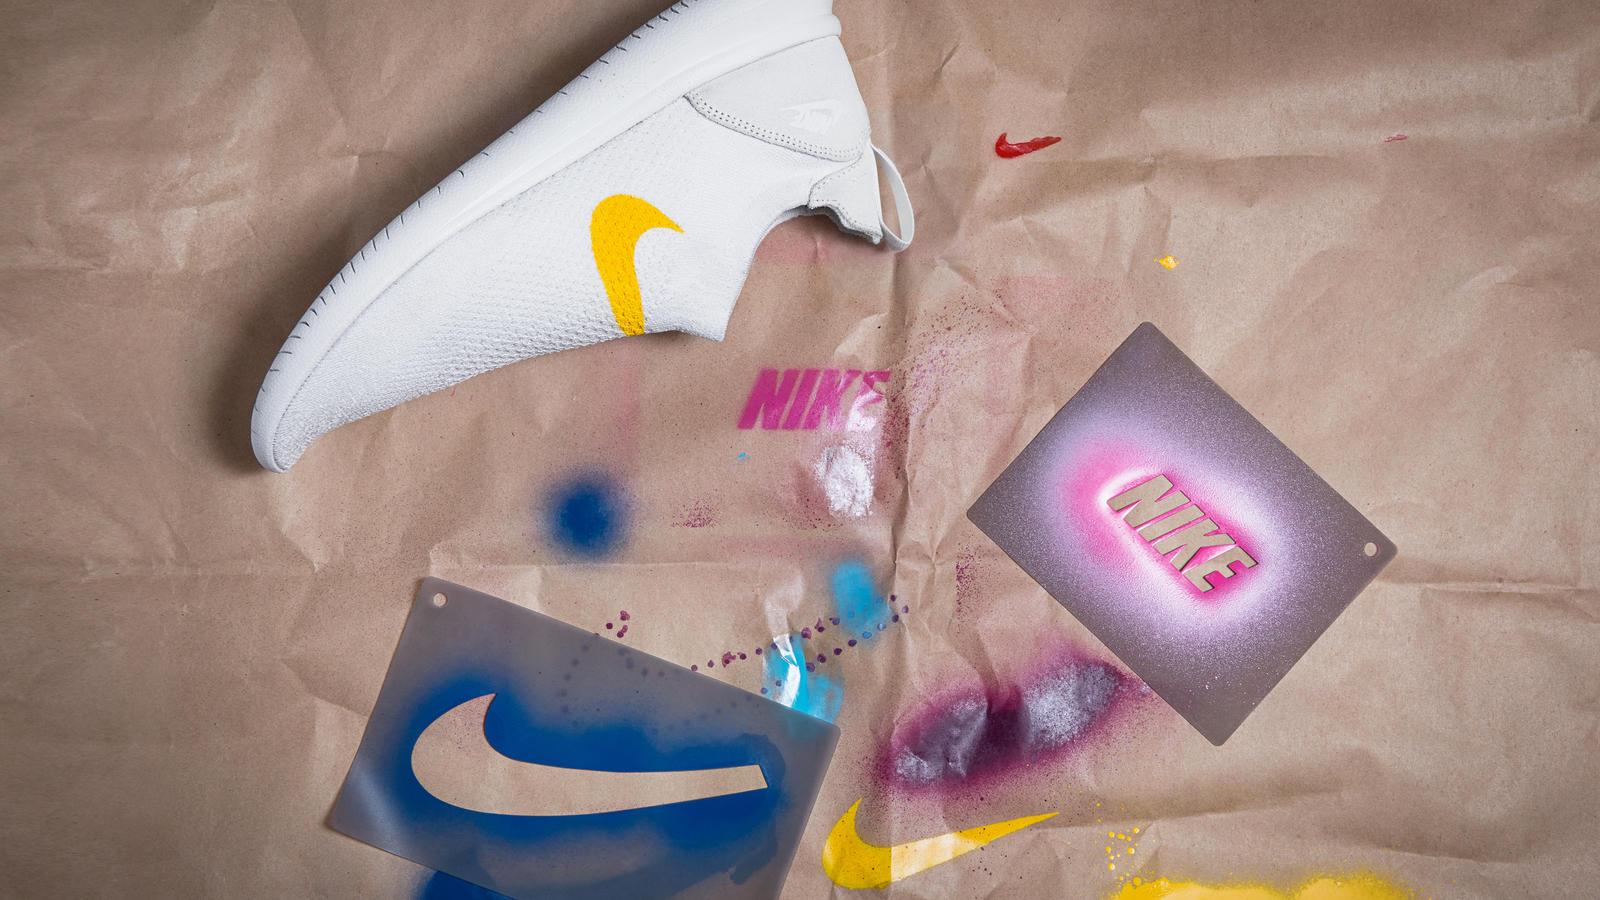 Maldito Brillante Leche  The New DIY Nike Gakou Flyknit - Nike News